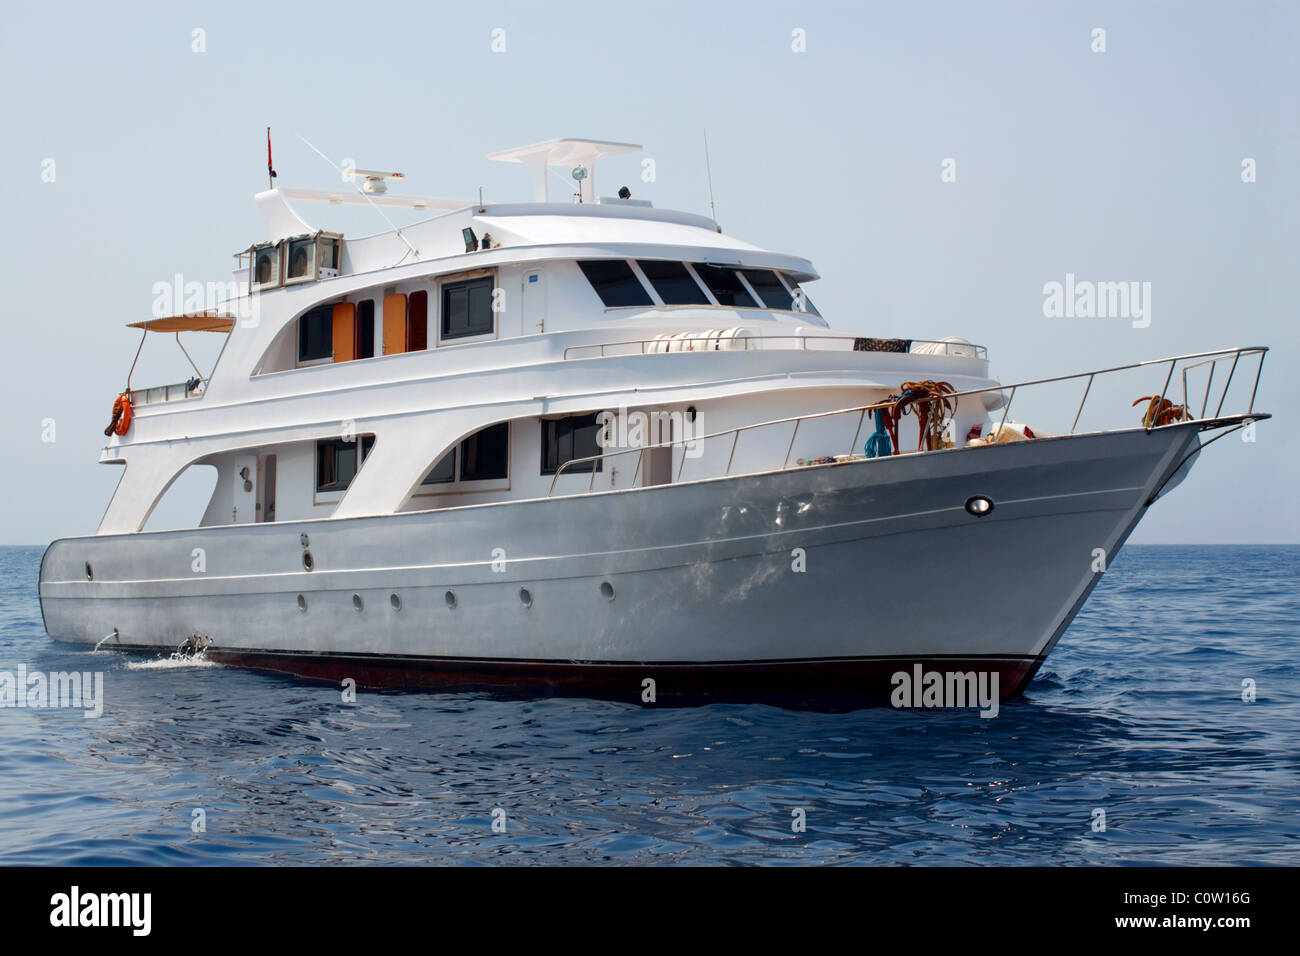 Sea Yacht - Stock Image